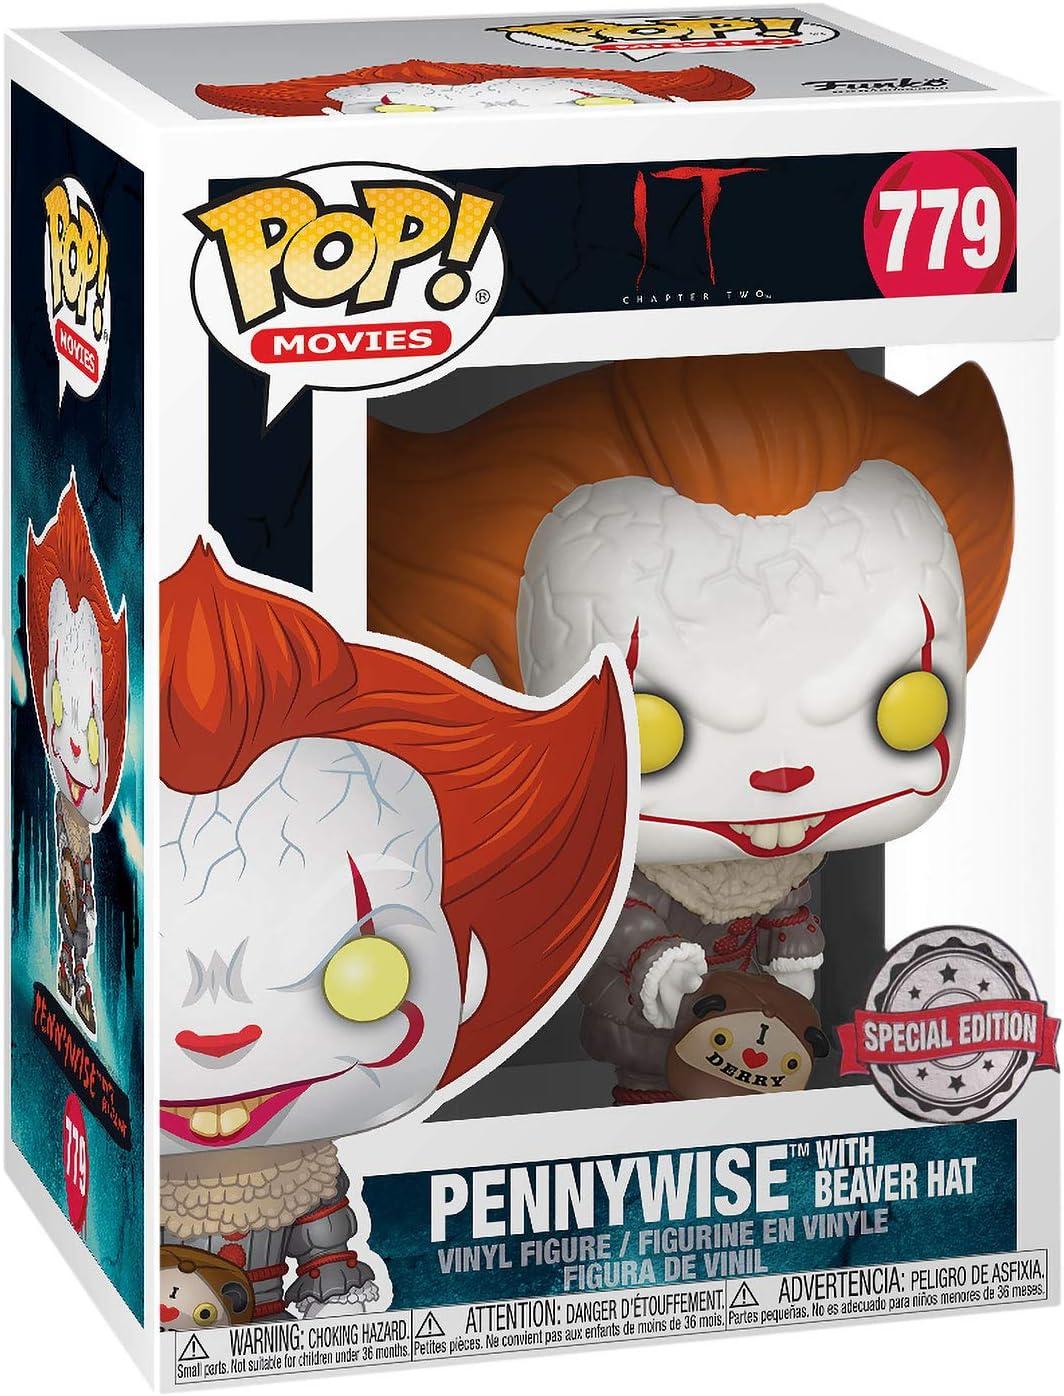 Pennywise Exclusive with Blade Vinyl Figure Collectors Bundle Funko Pop